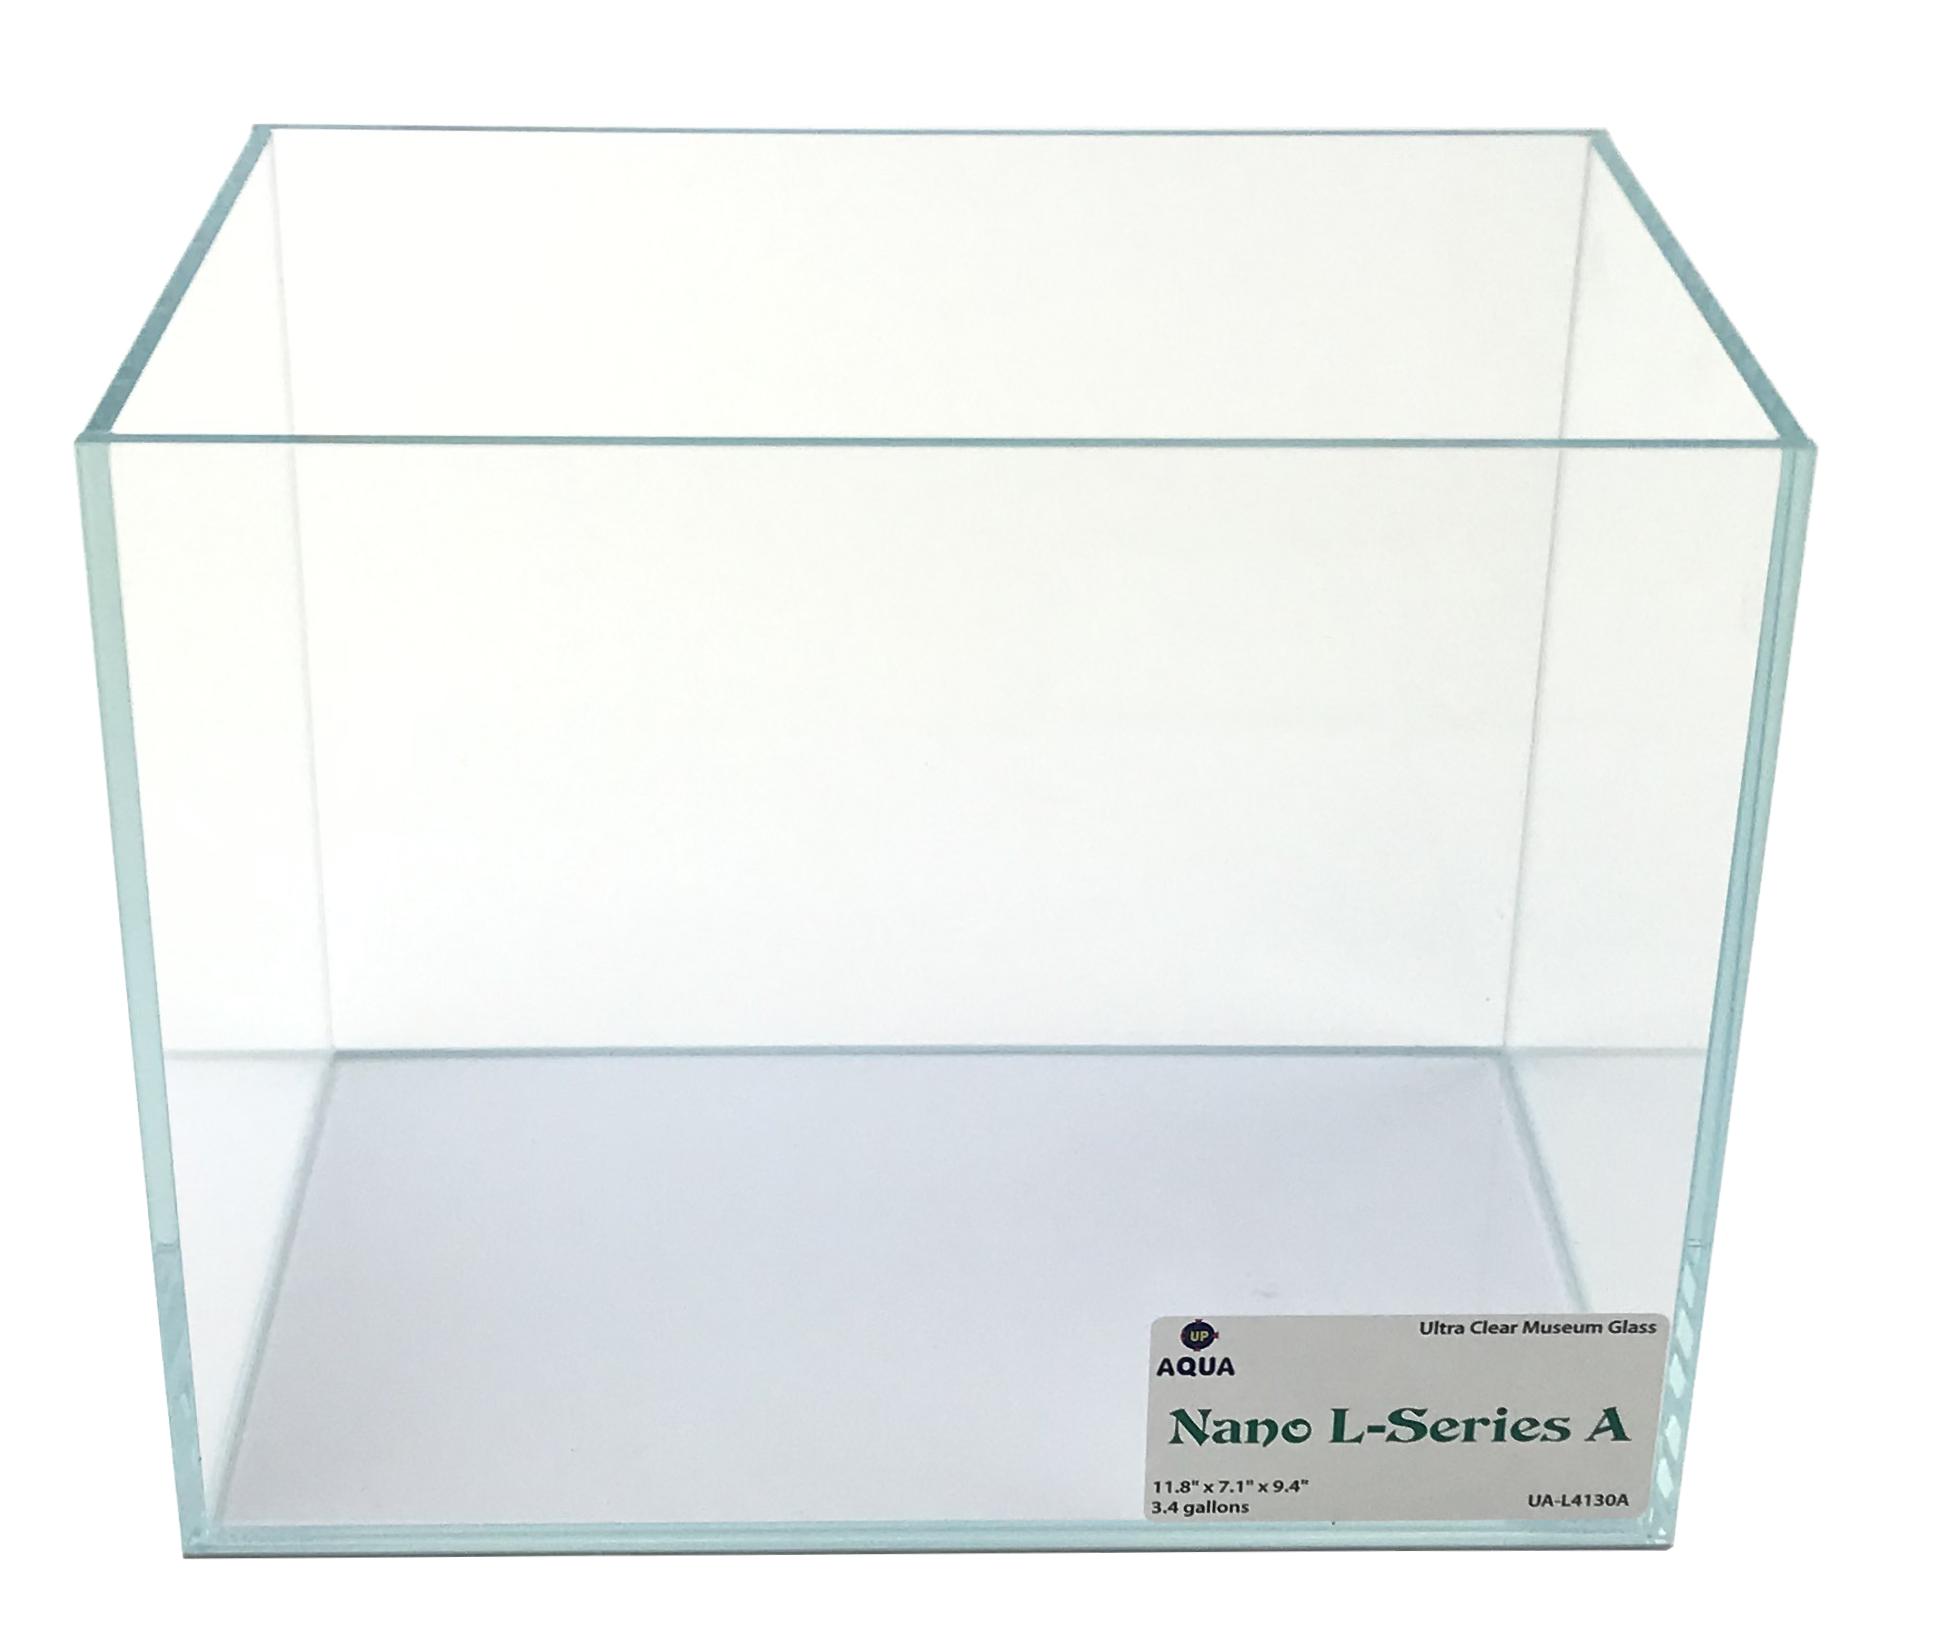 Nano L-series (LI) Ultra Clear Aquarium A - 3.4 Gal. 11.8